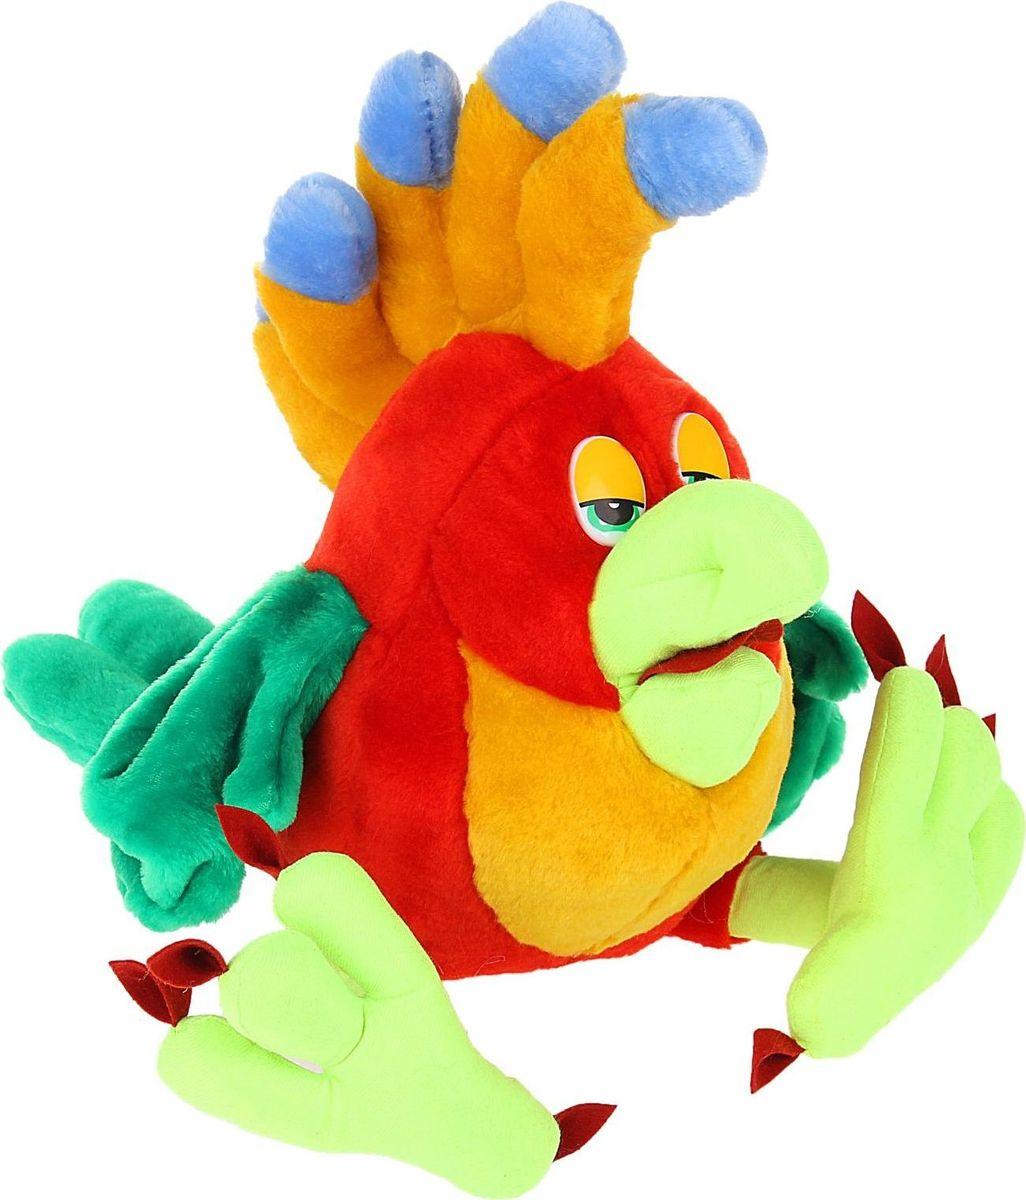 Sima-land Мягкая игрушка Попугай Рома 35 см sima land мягкая игрушка собака хаски 40 см